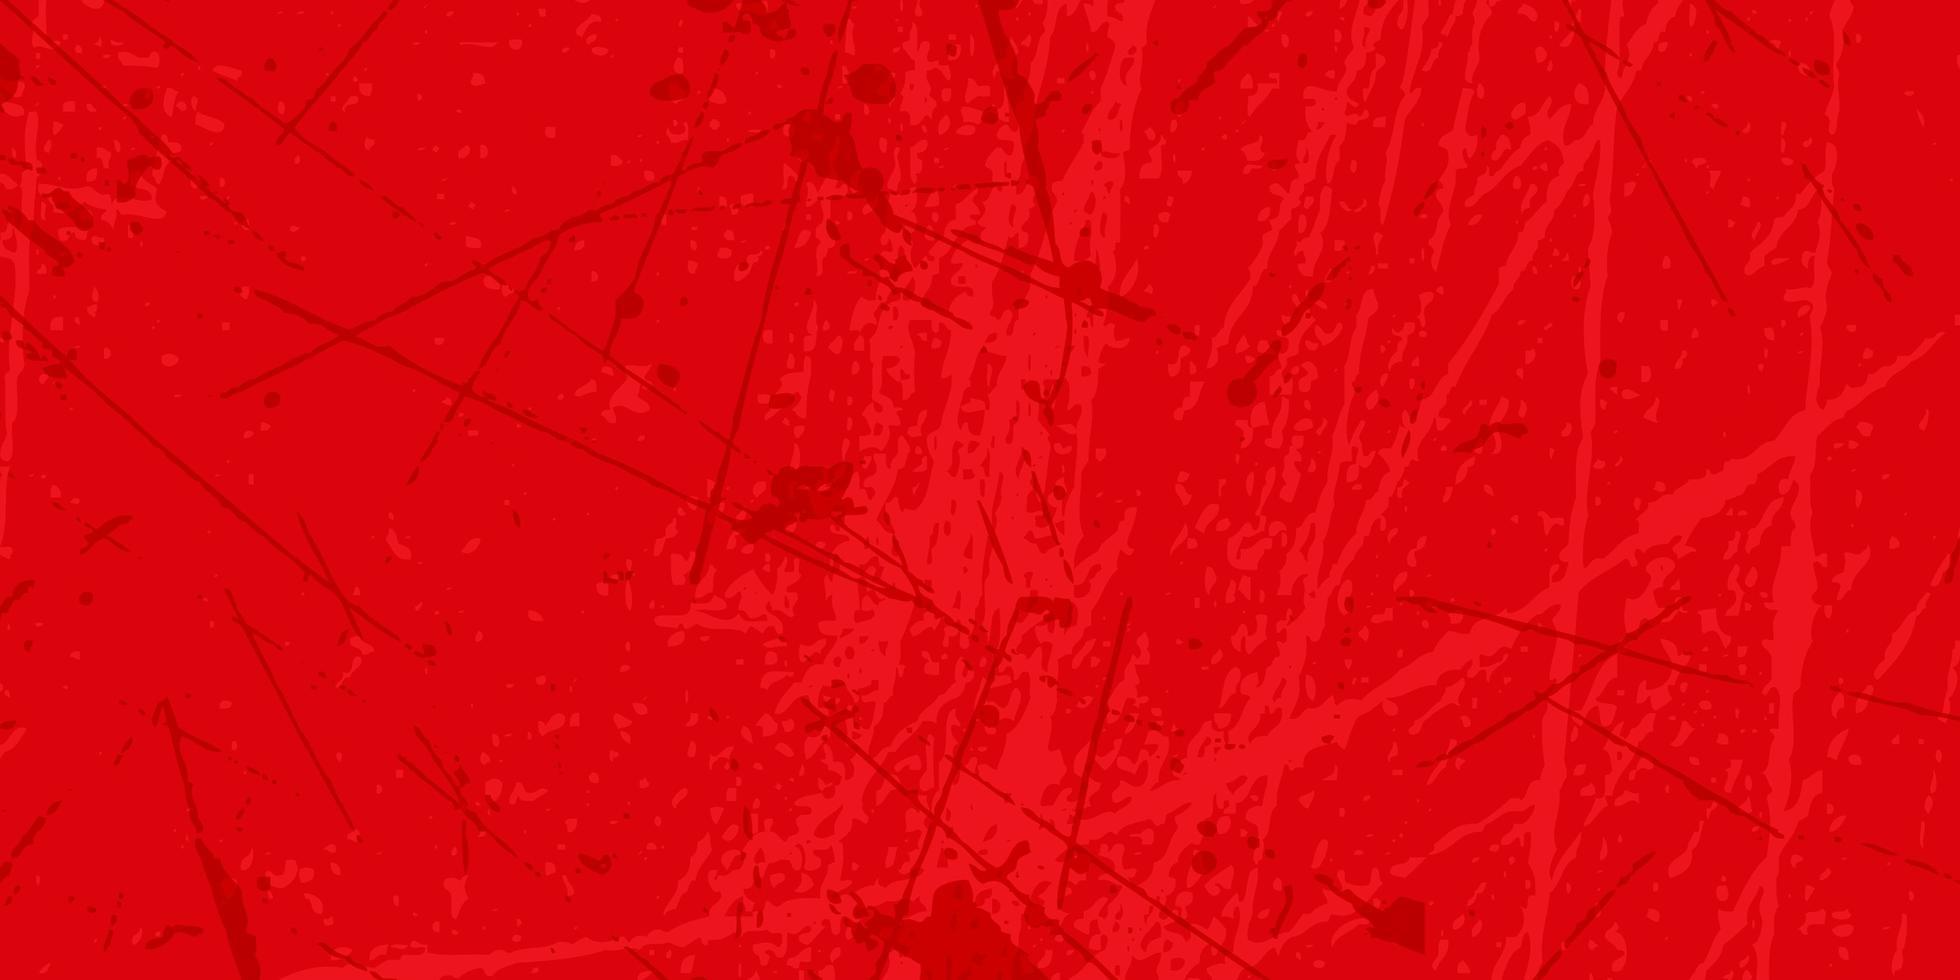 Red grunge texture banner  vector